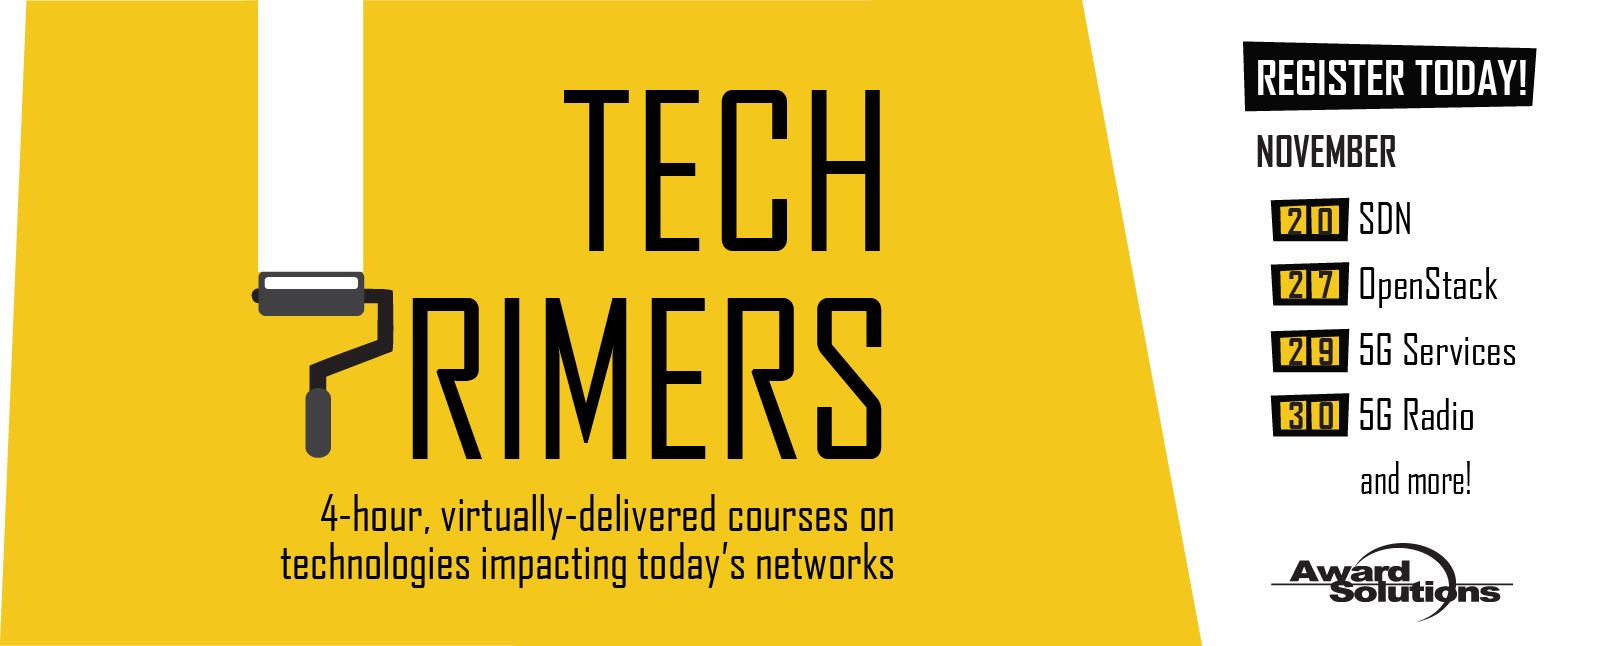 Tech Primers Americas November Part II Website 775 x 310-01.png